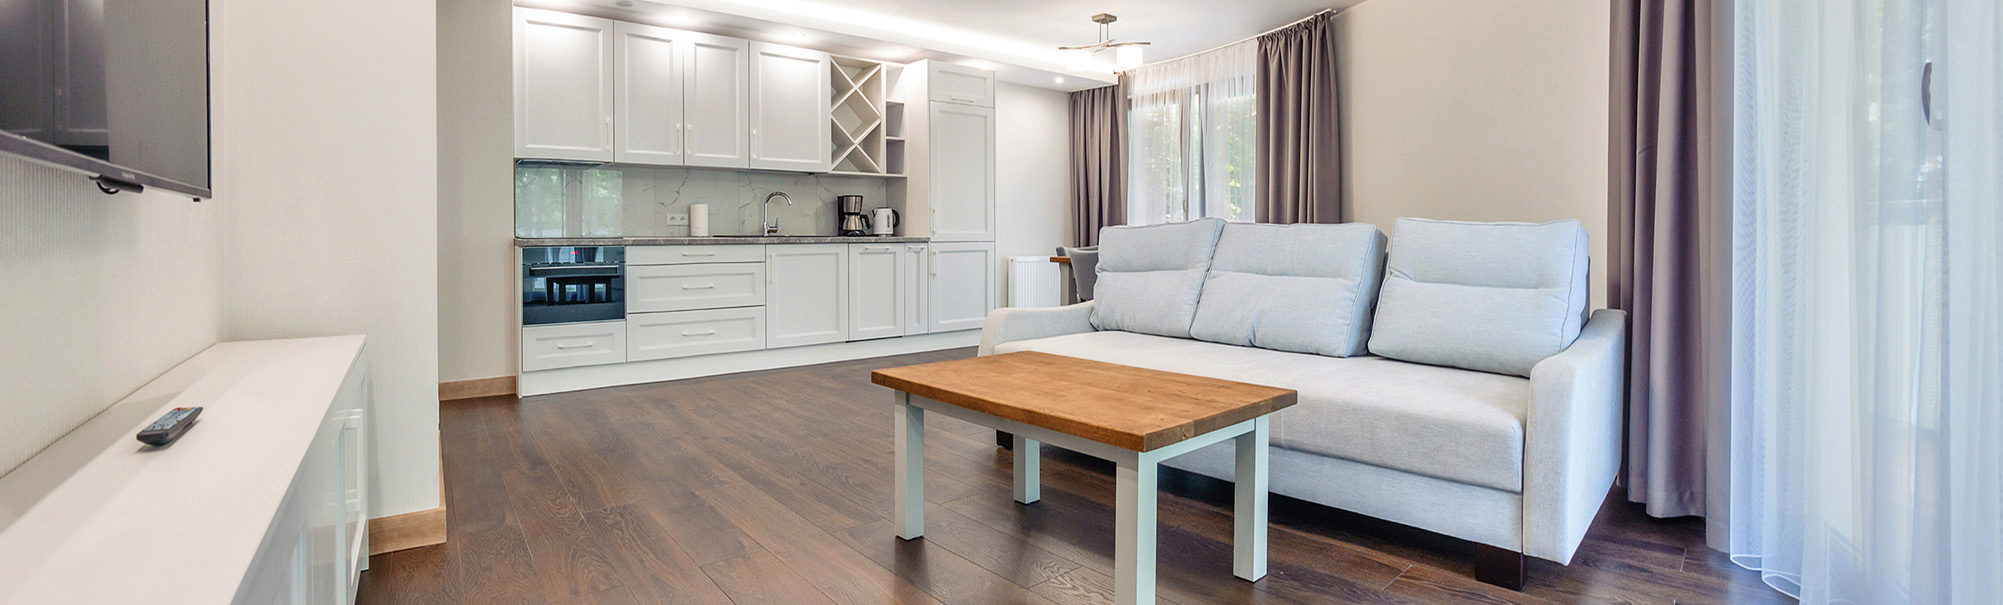 Apartamenty Sun&Snow Apartament Delux A 13 Hel - Cypel Helski